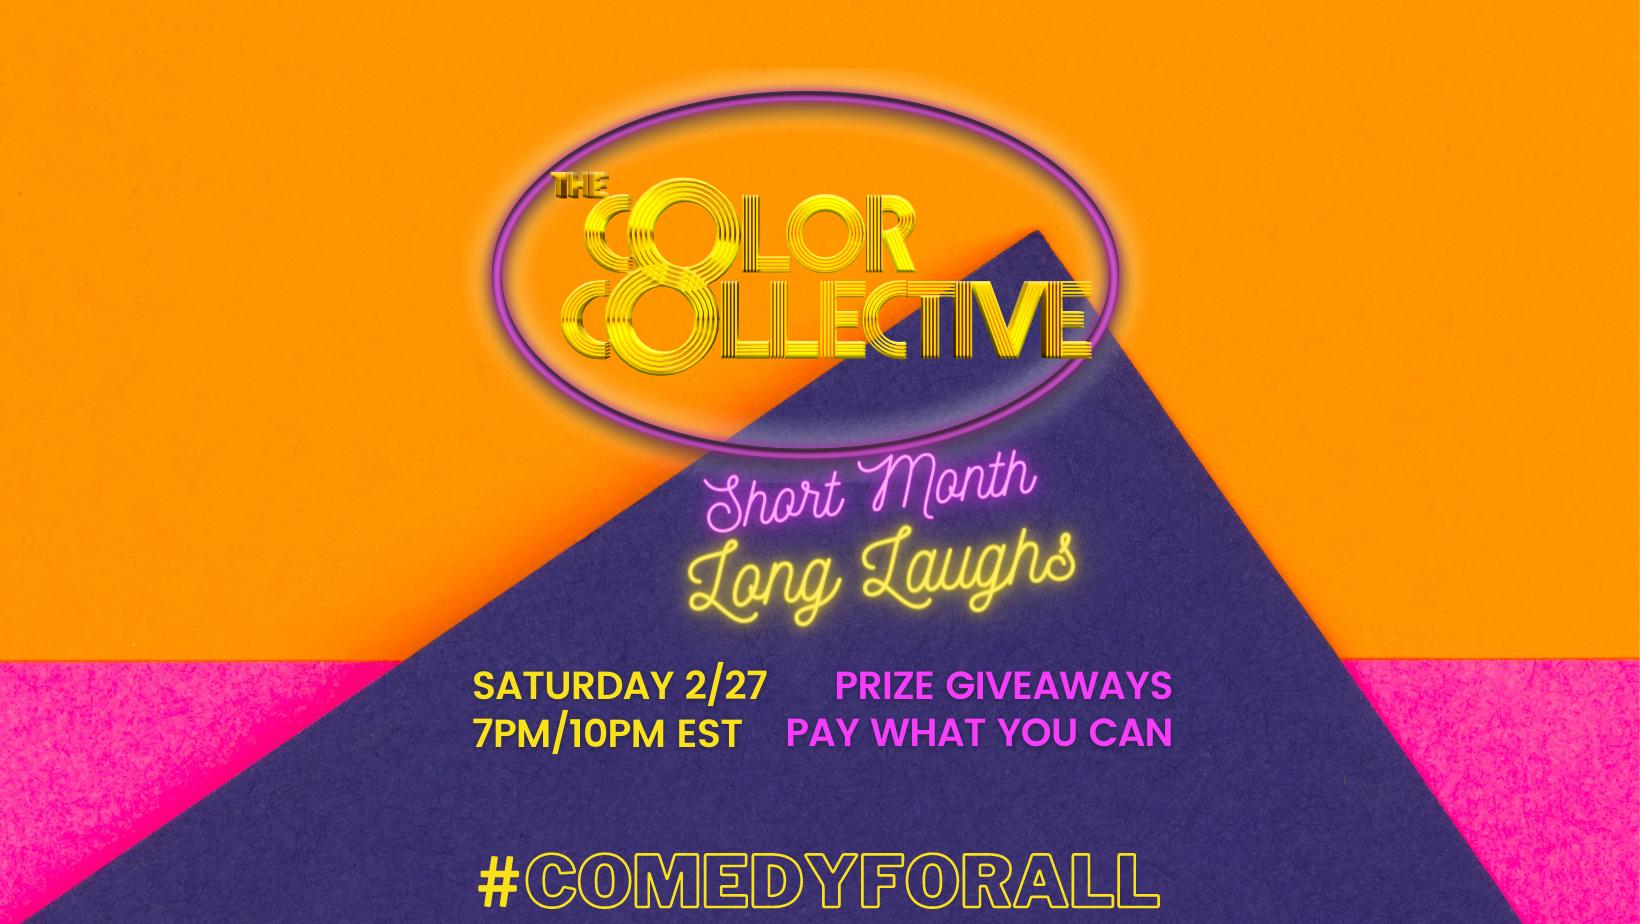 The Color Collective : Short Month, Long Laughs - Online